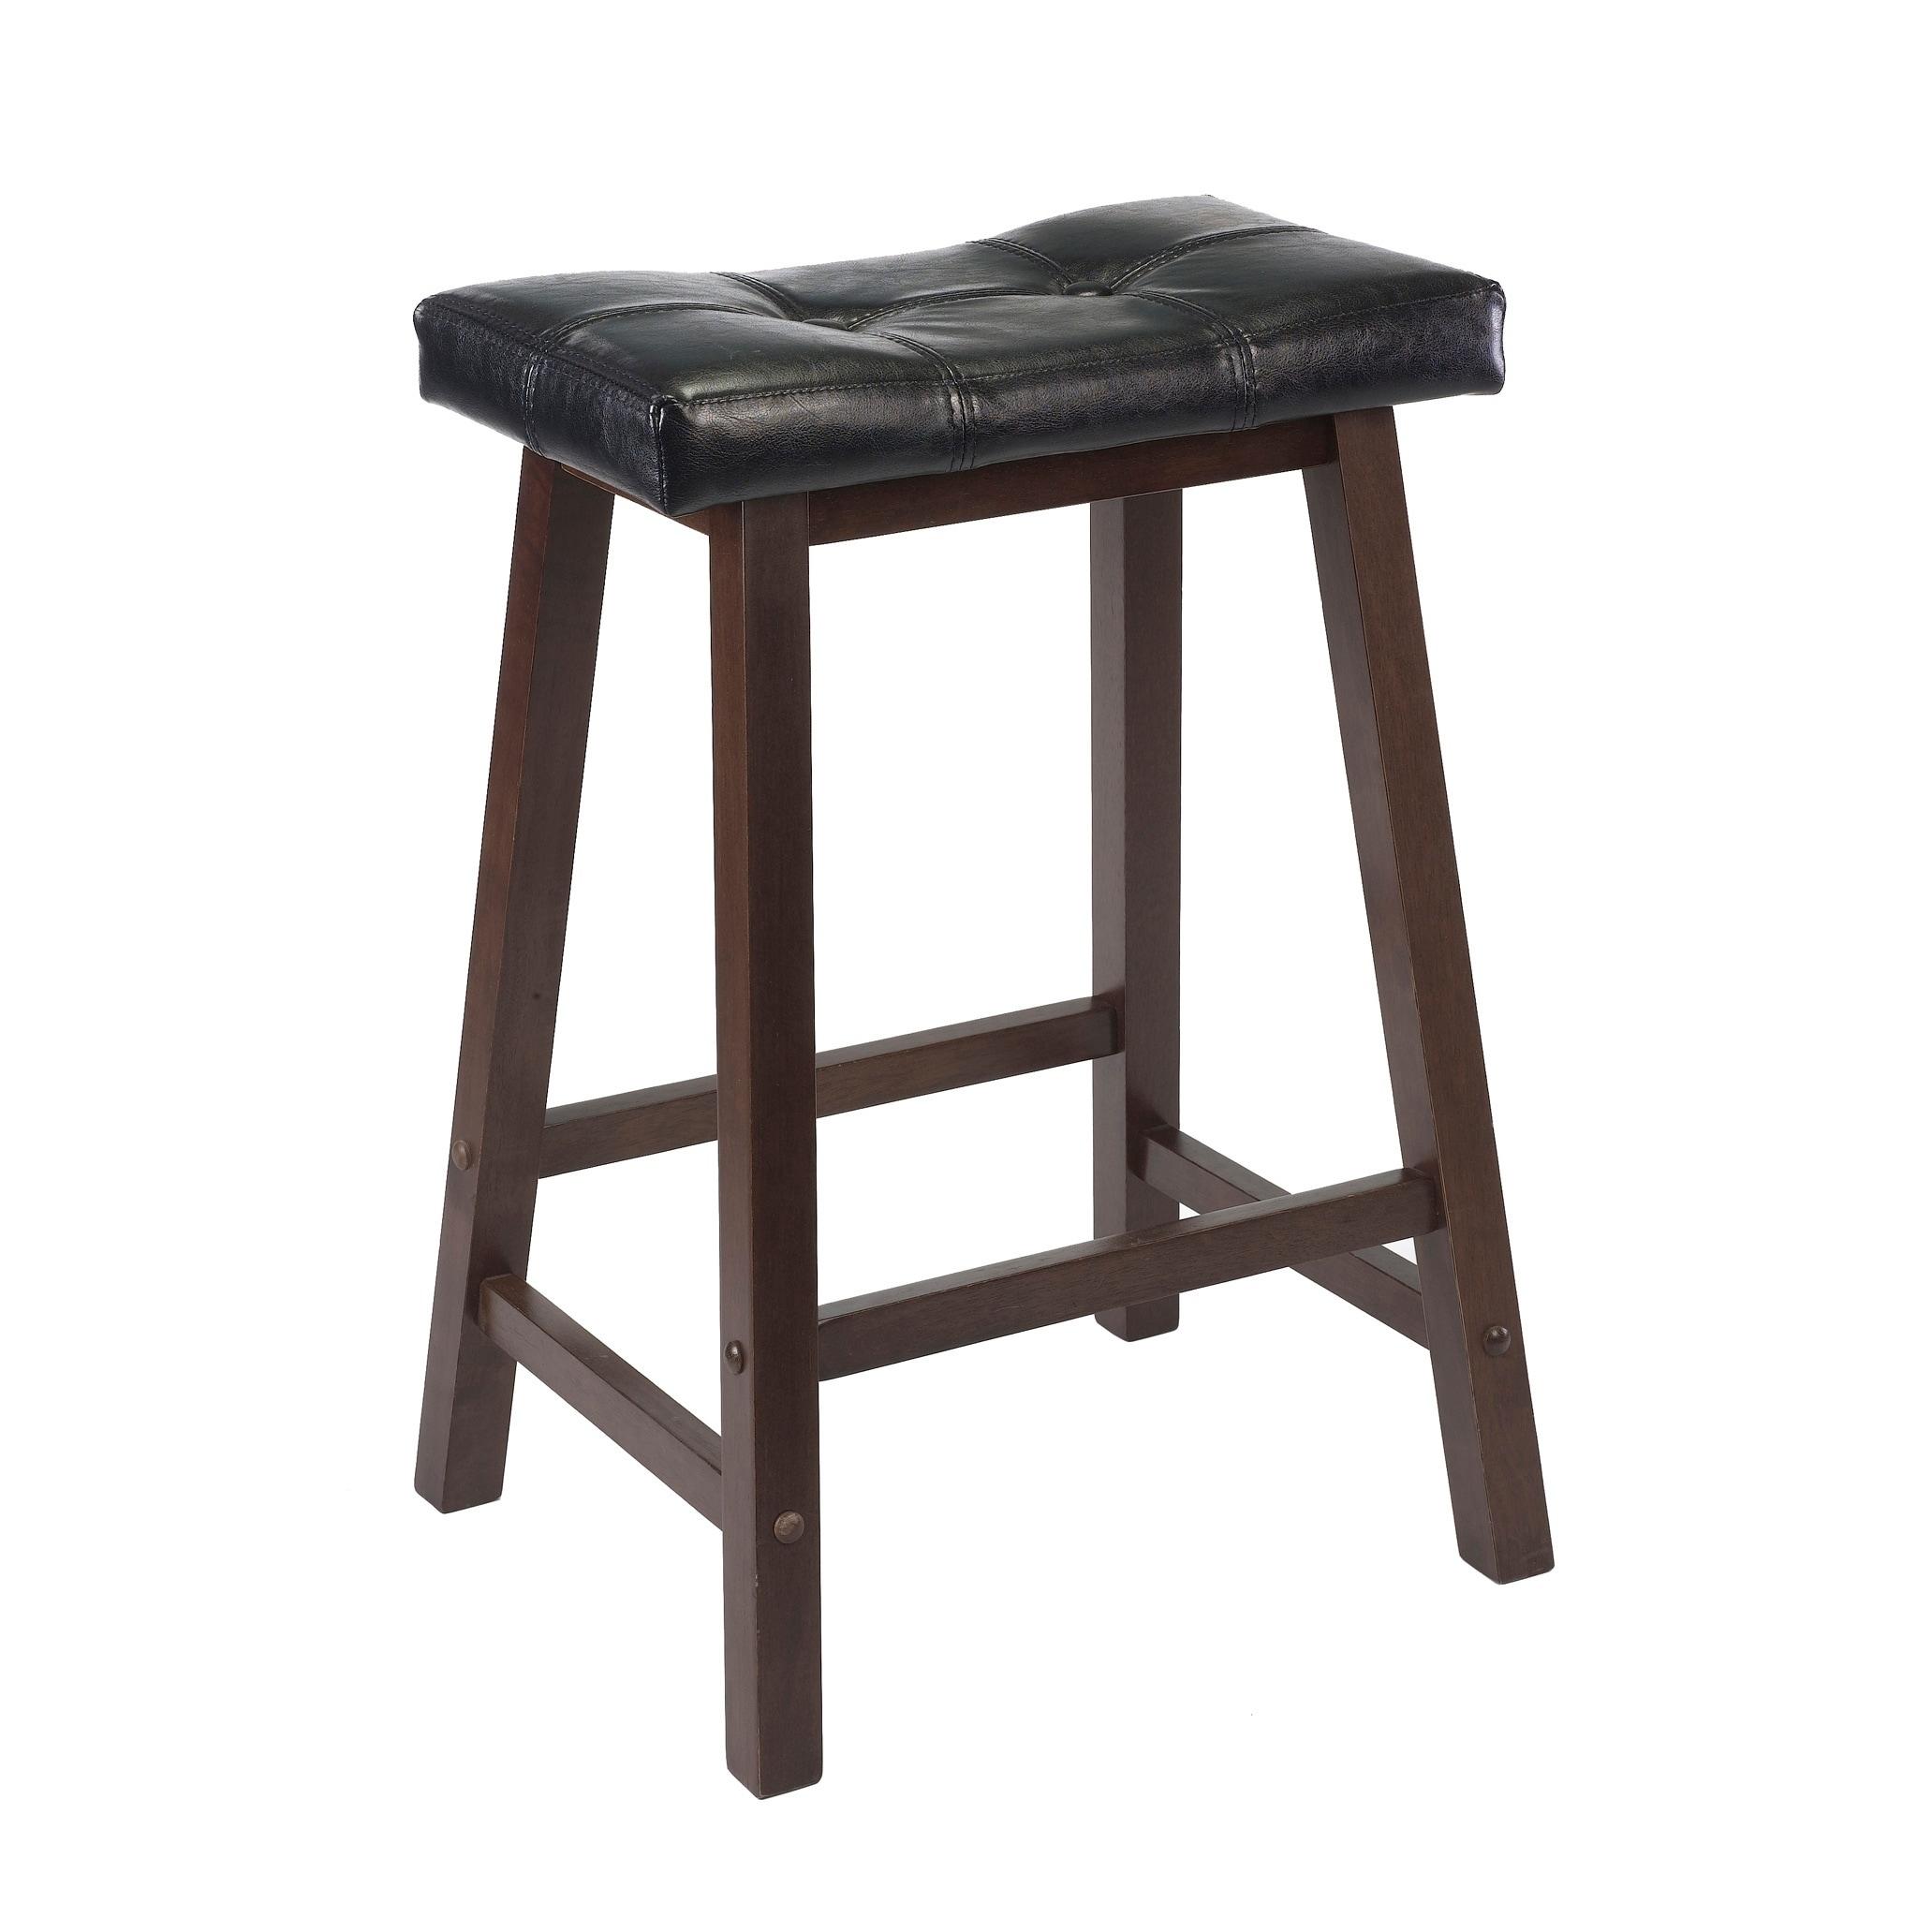 Mona 24 Cushion Saddle Seat Stool Black Faux Leather Wood Legs Rta